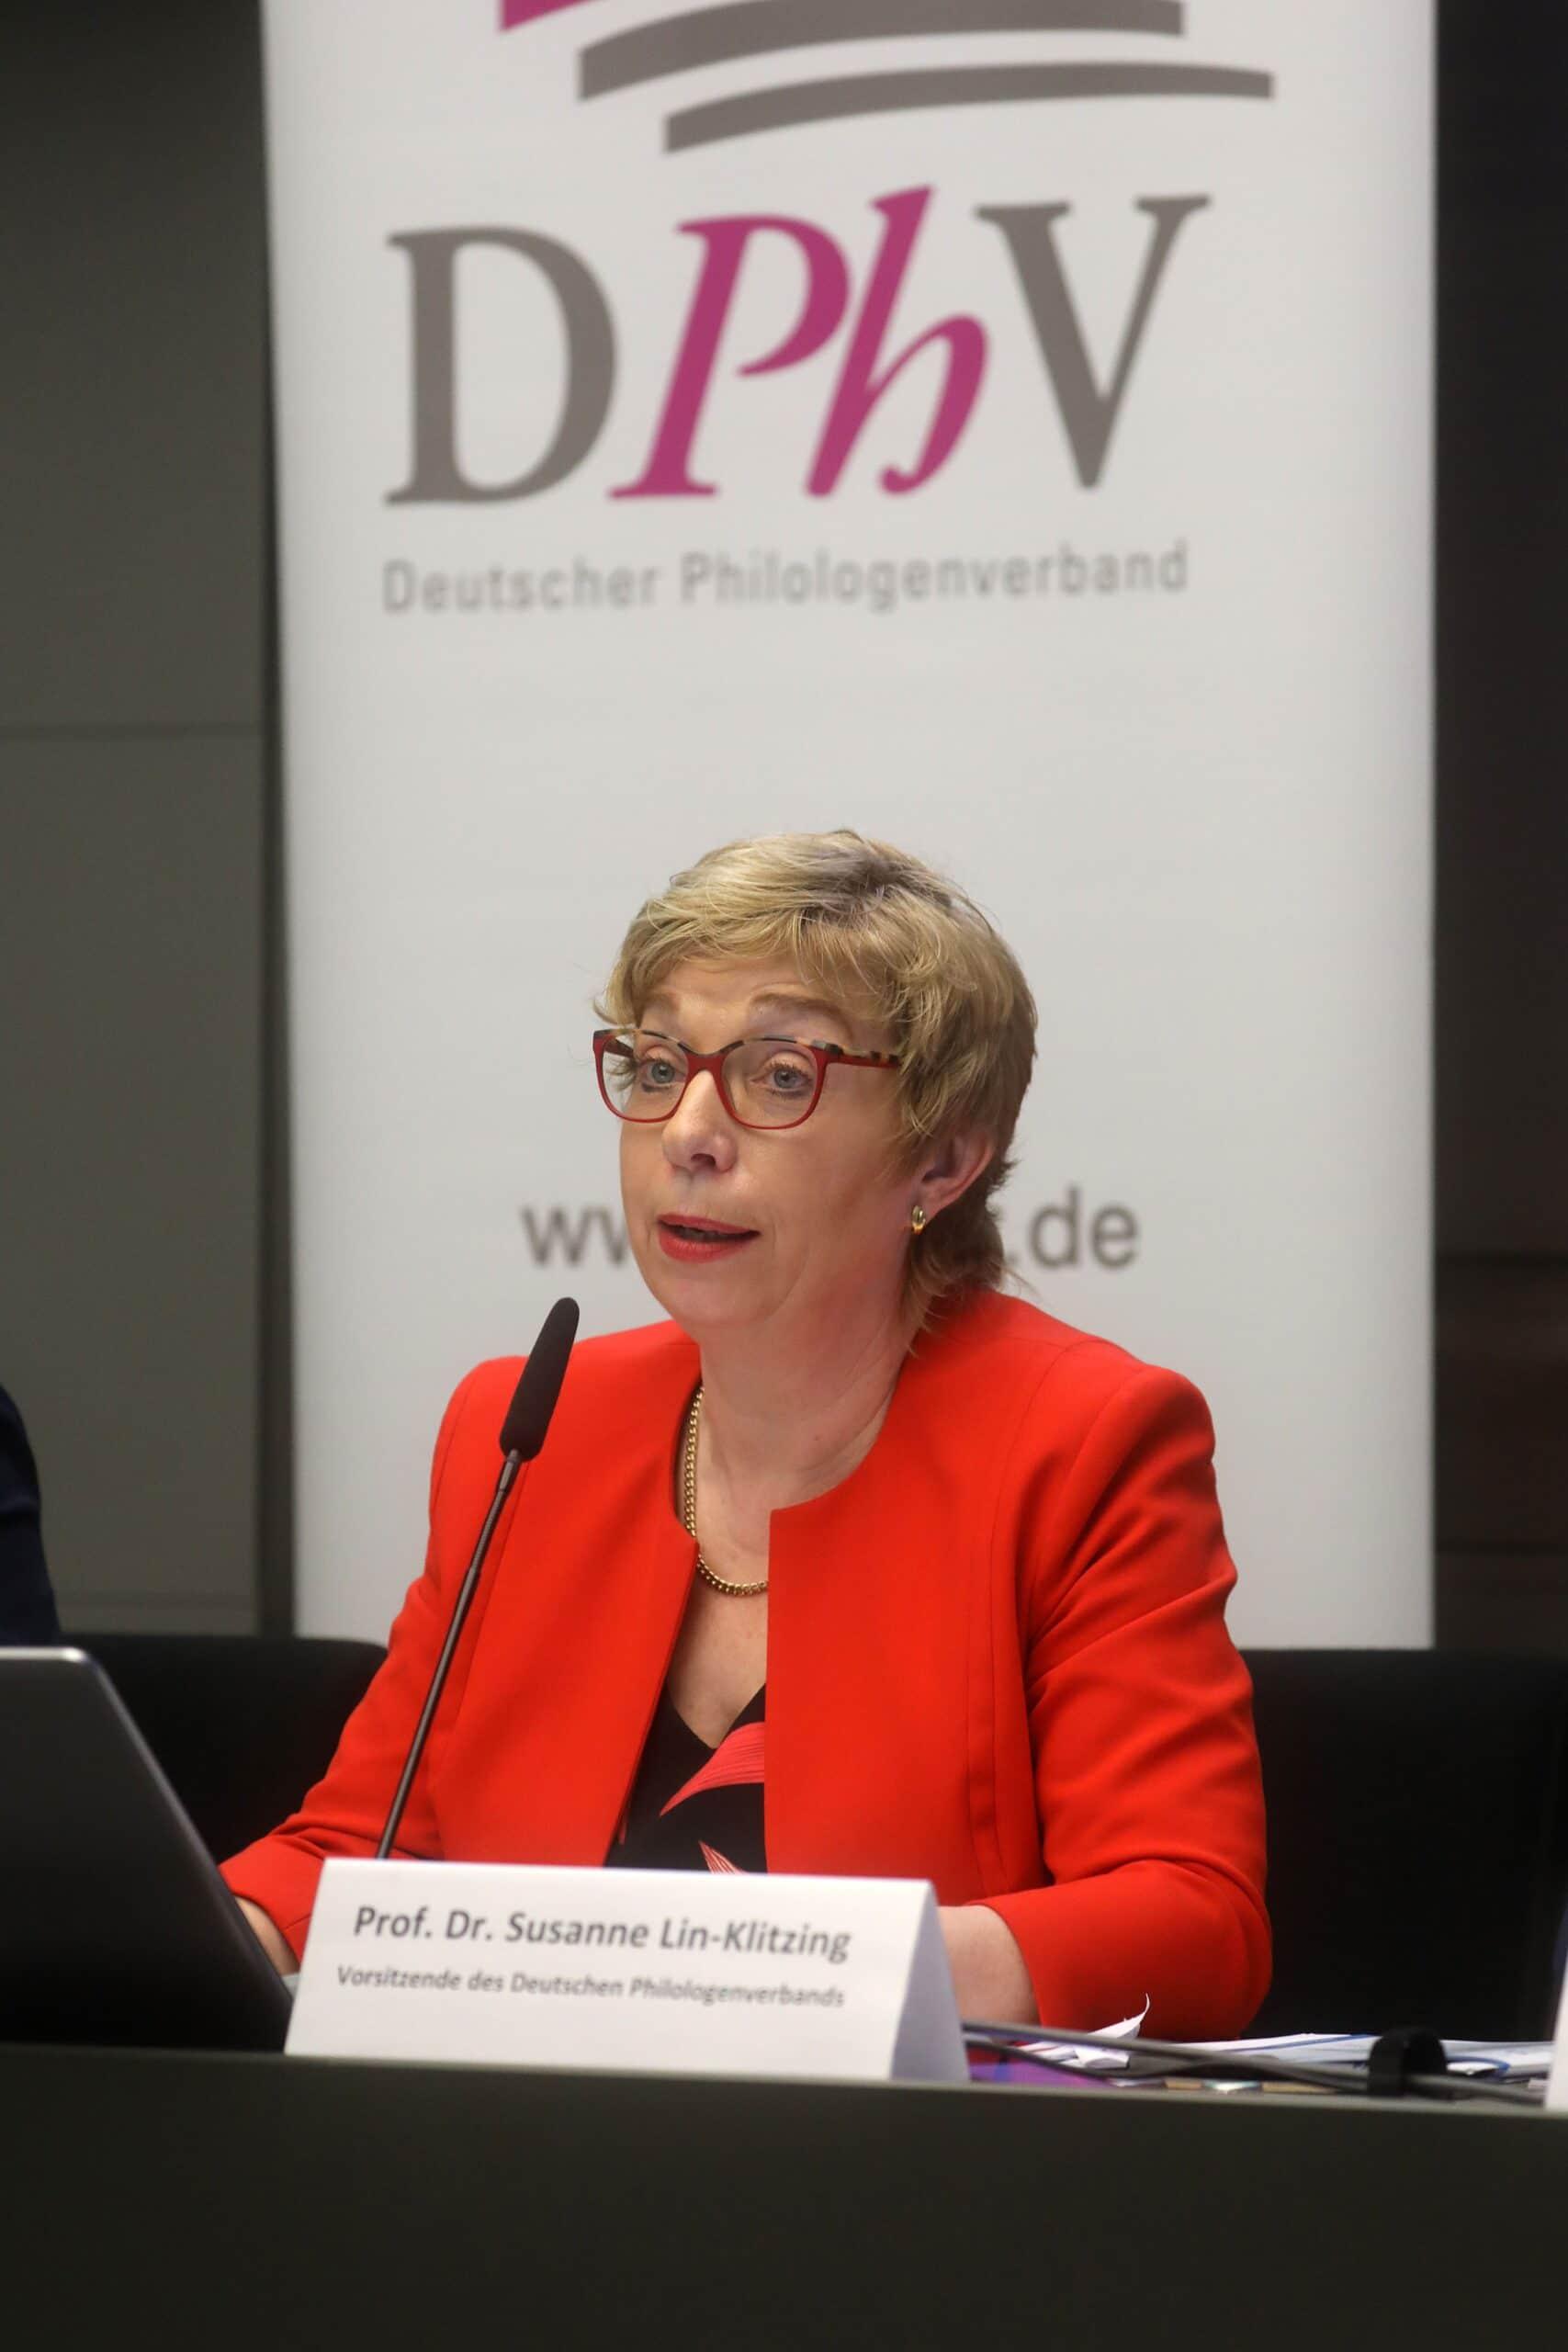 Prof. Dr. Susanne Lin-Klitzing vom DPhV